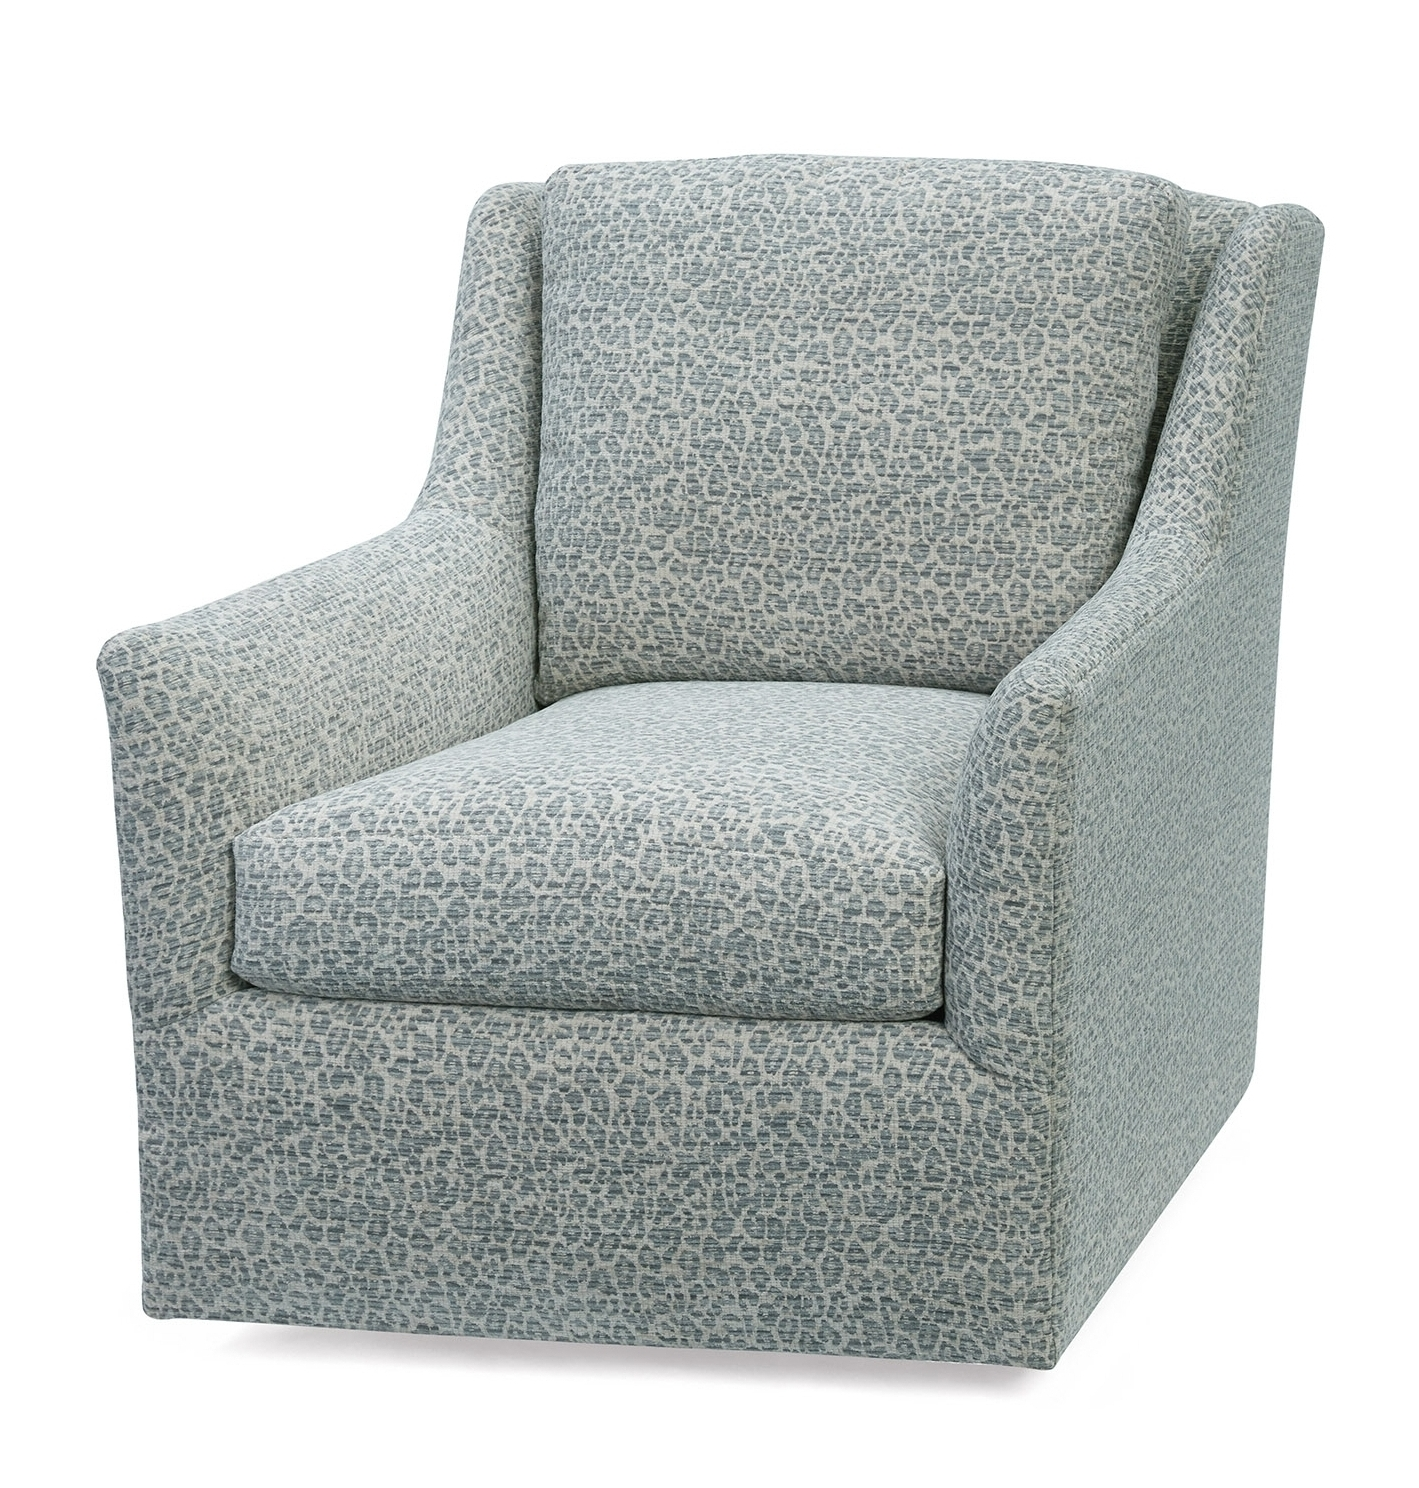 Chairs & Ottomans Massoud Furniture